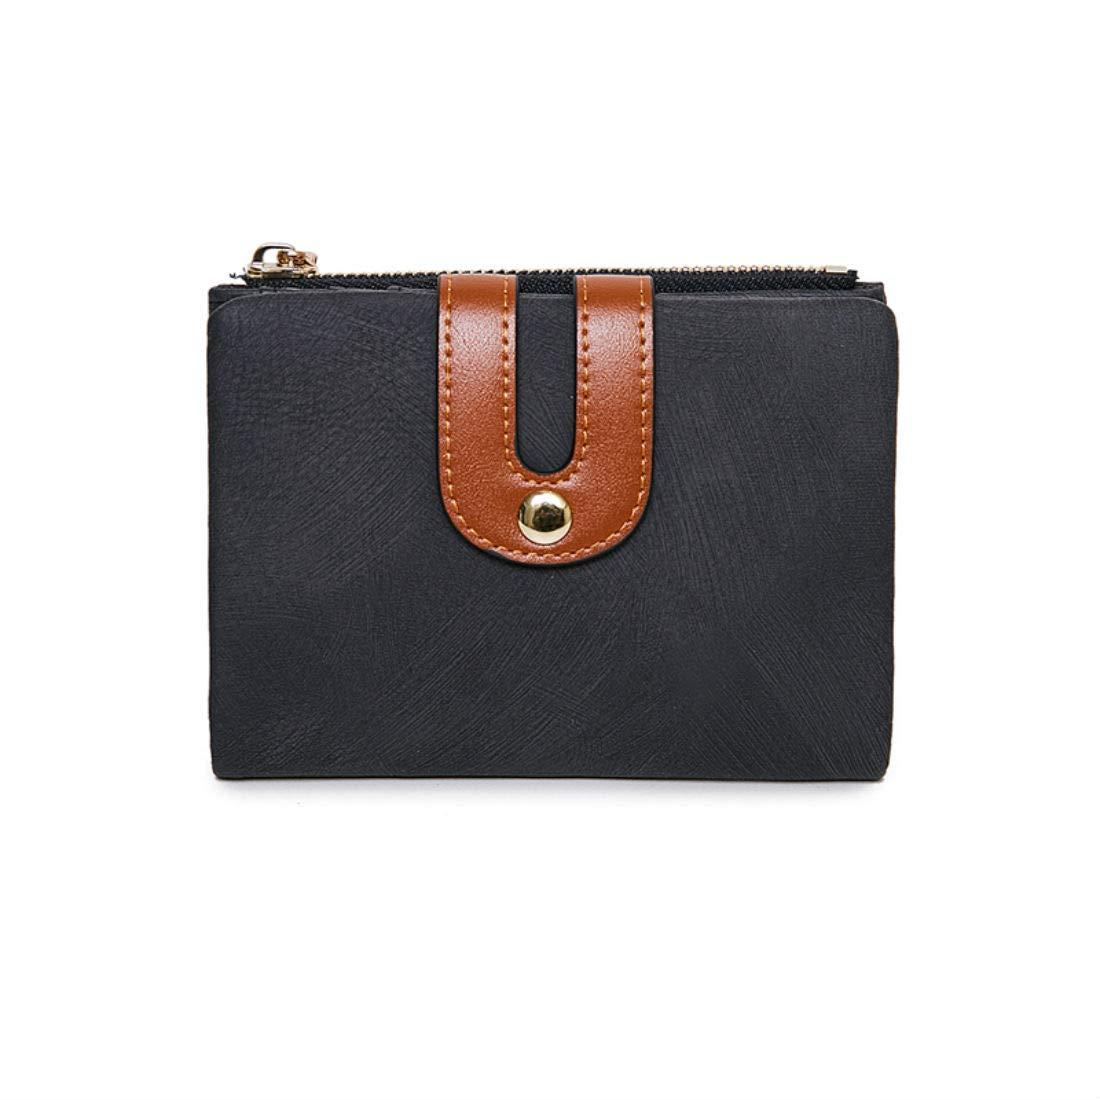 Women's Small Wallet Bifold Soft Leather Thin Short Wallets RFID Blocking Ladies Mini Purse with ID Window (Black)